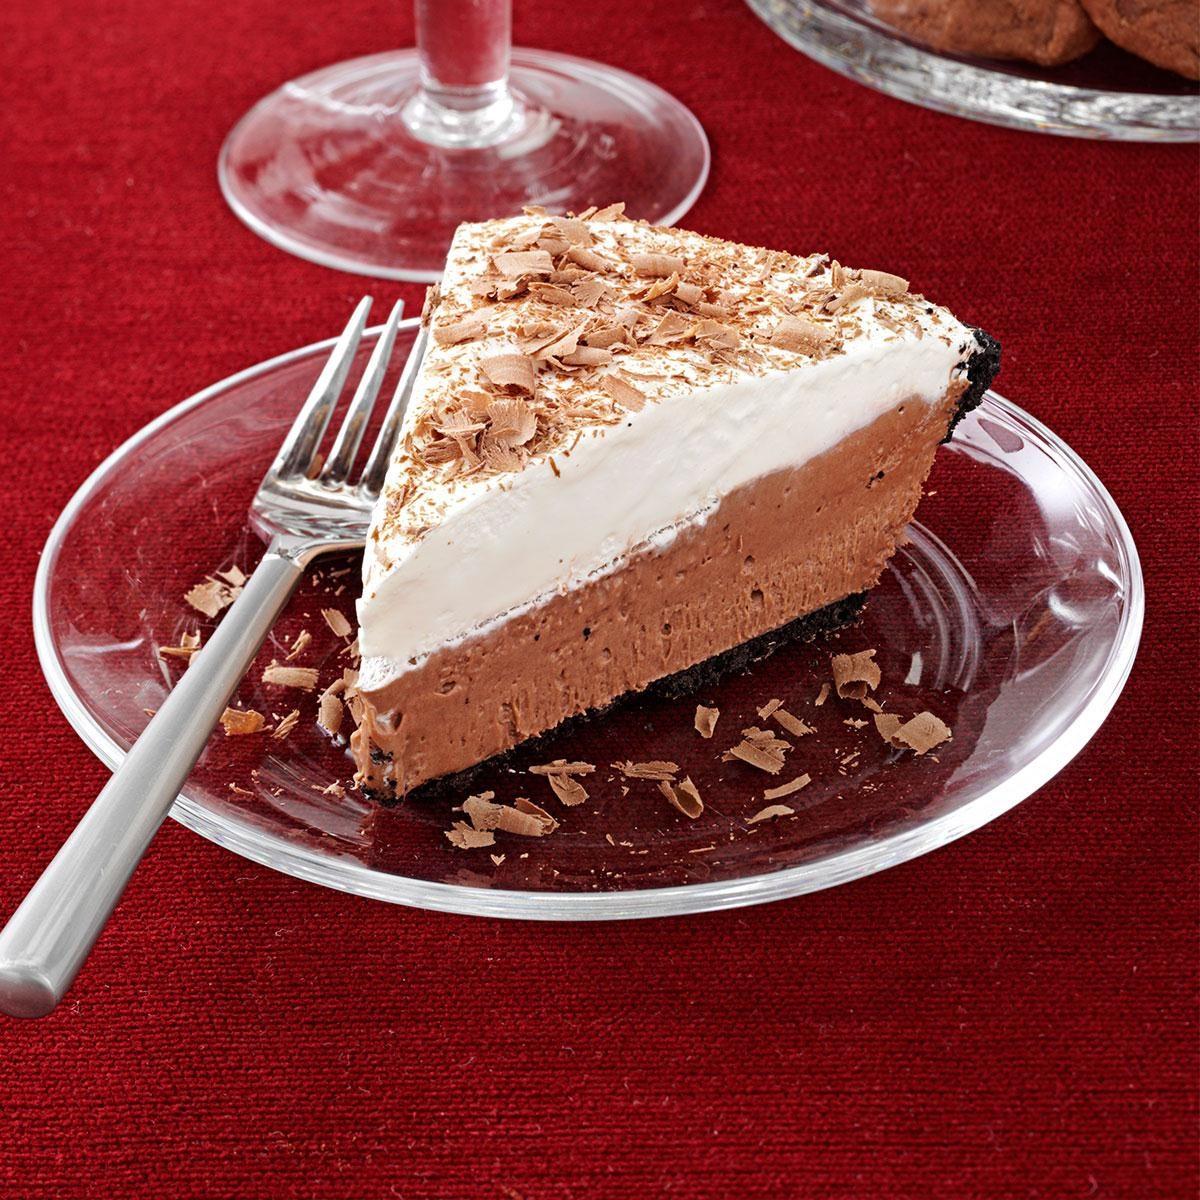 Chocolate Lover's Cream Pie Recipe | Taste of Home